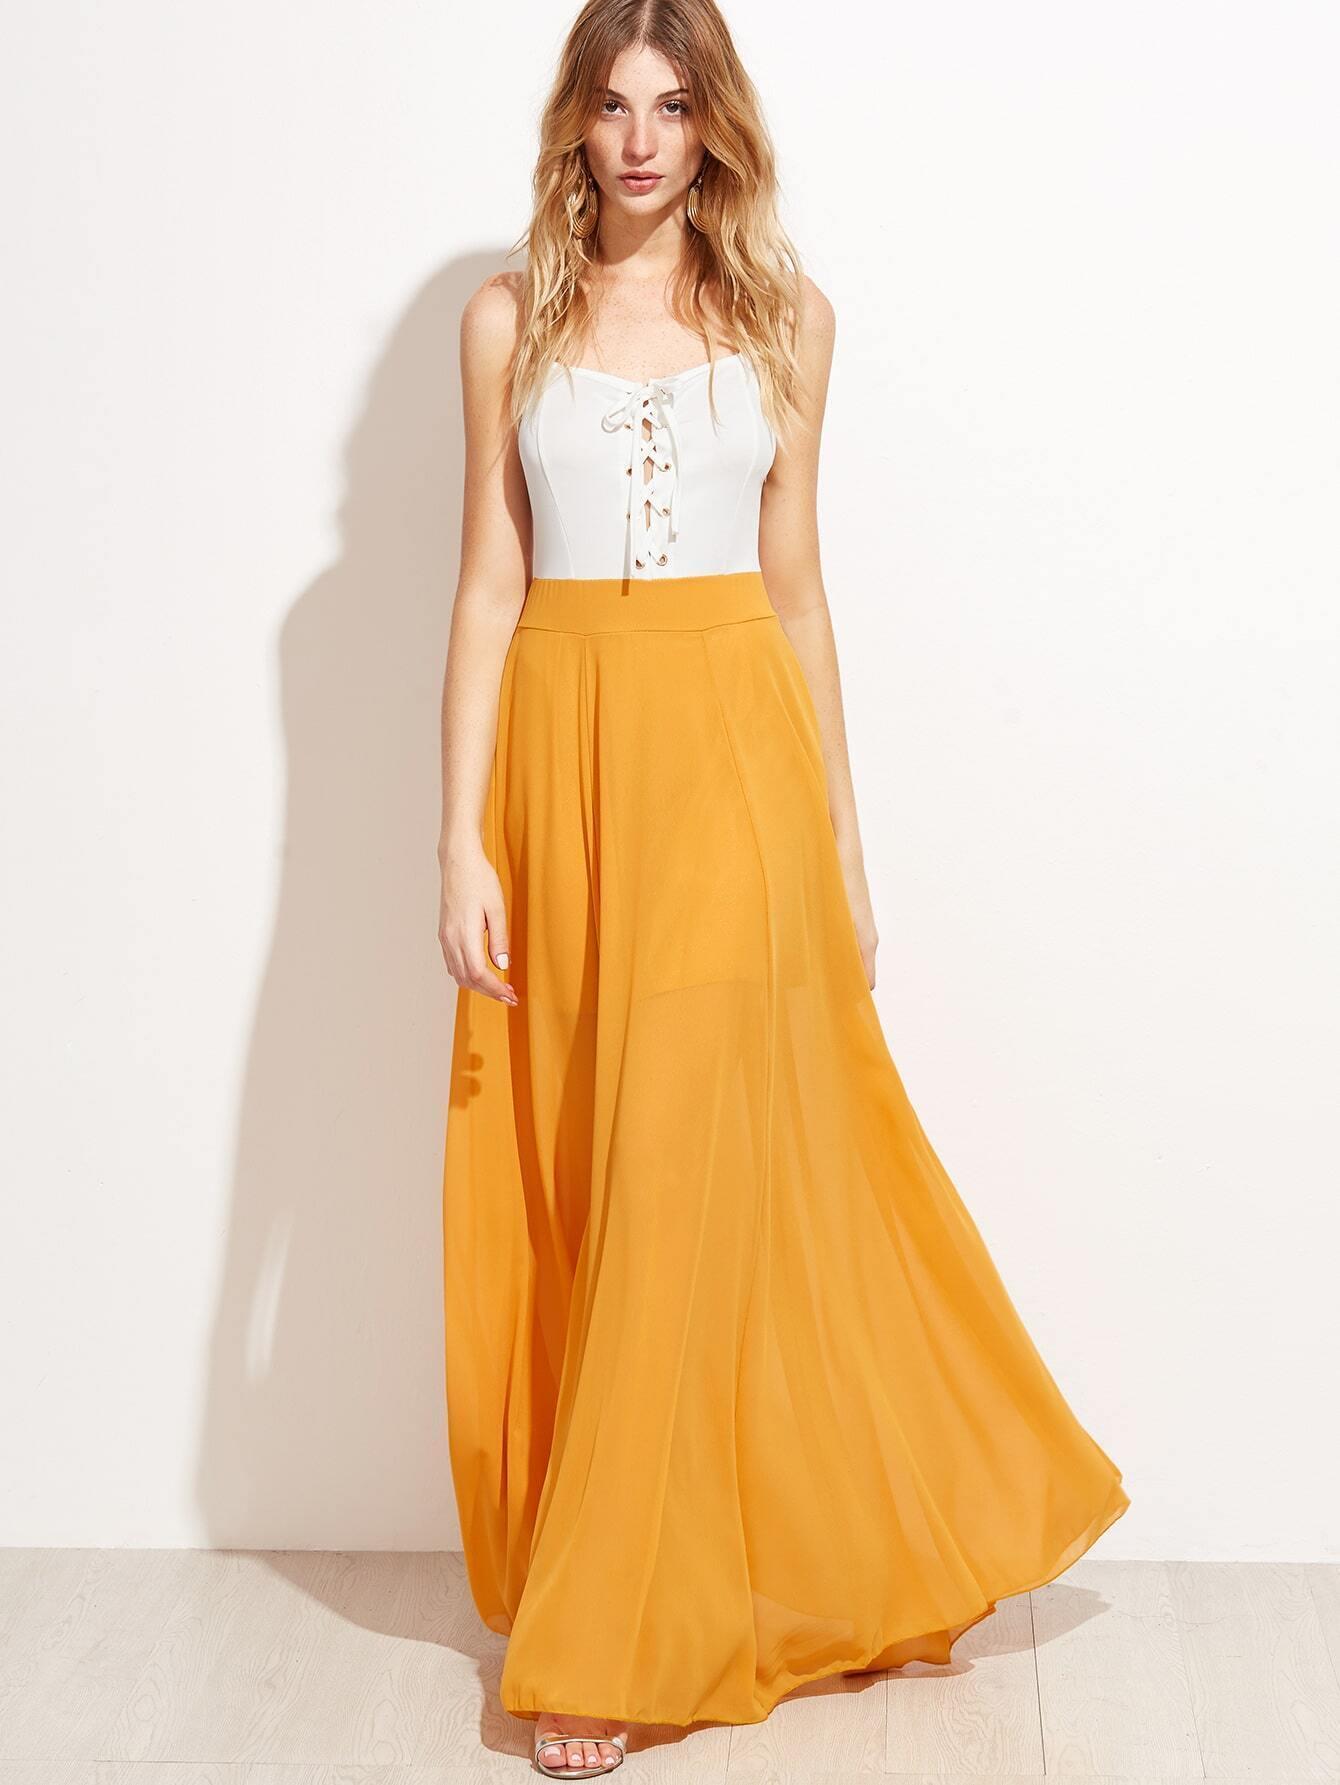 0933f44bd9a Yellow Contrast Eyelet Lace Up Split Slip Dress EmmaCloth-Women Fast ...